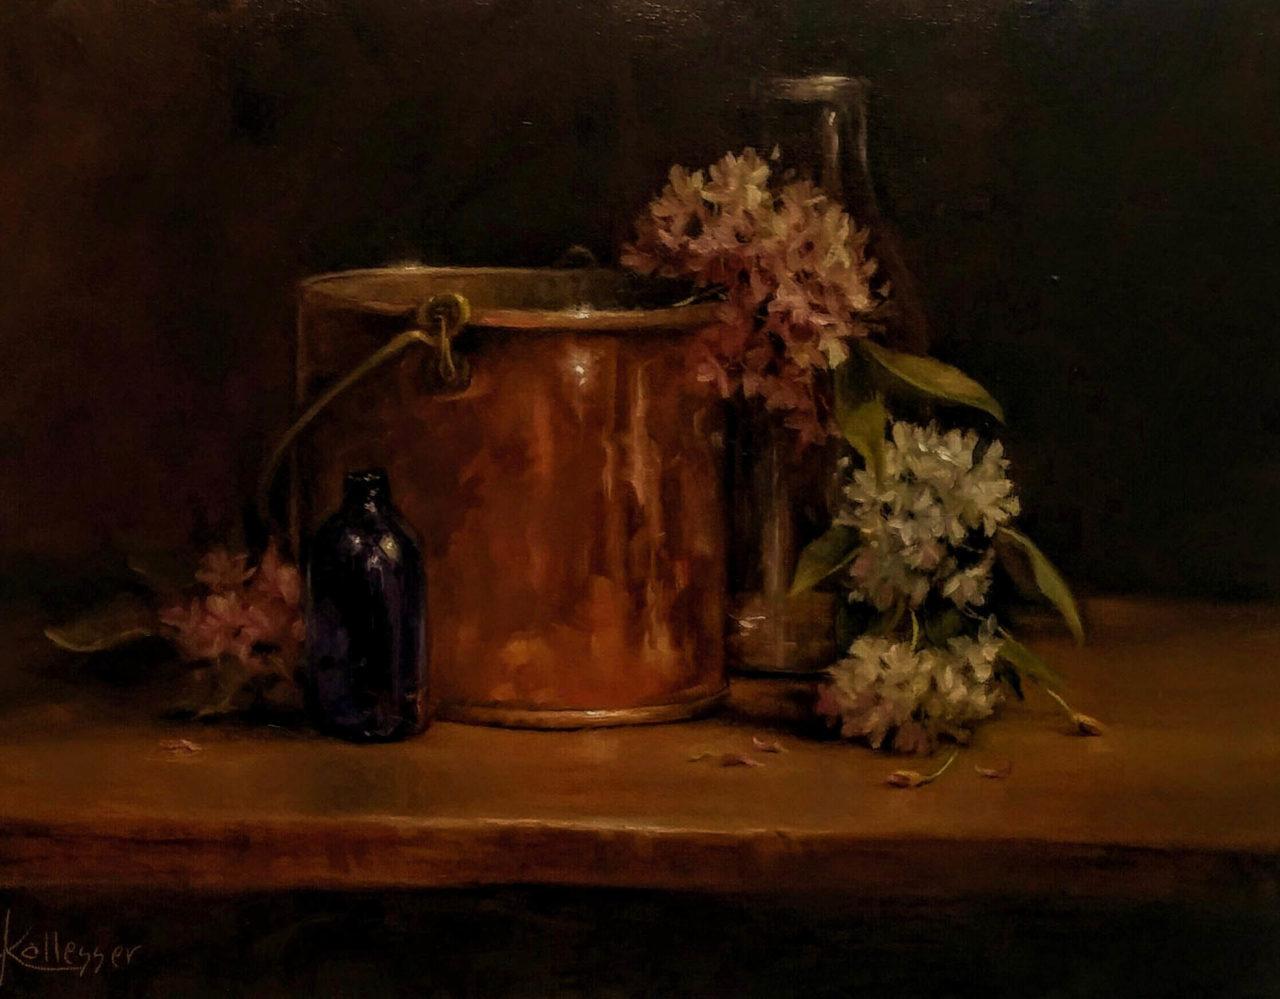 Copper Pail - Donna Kallesser